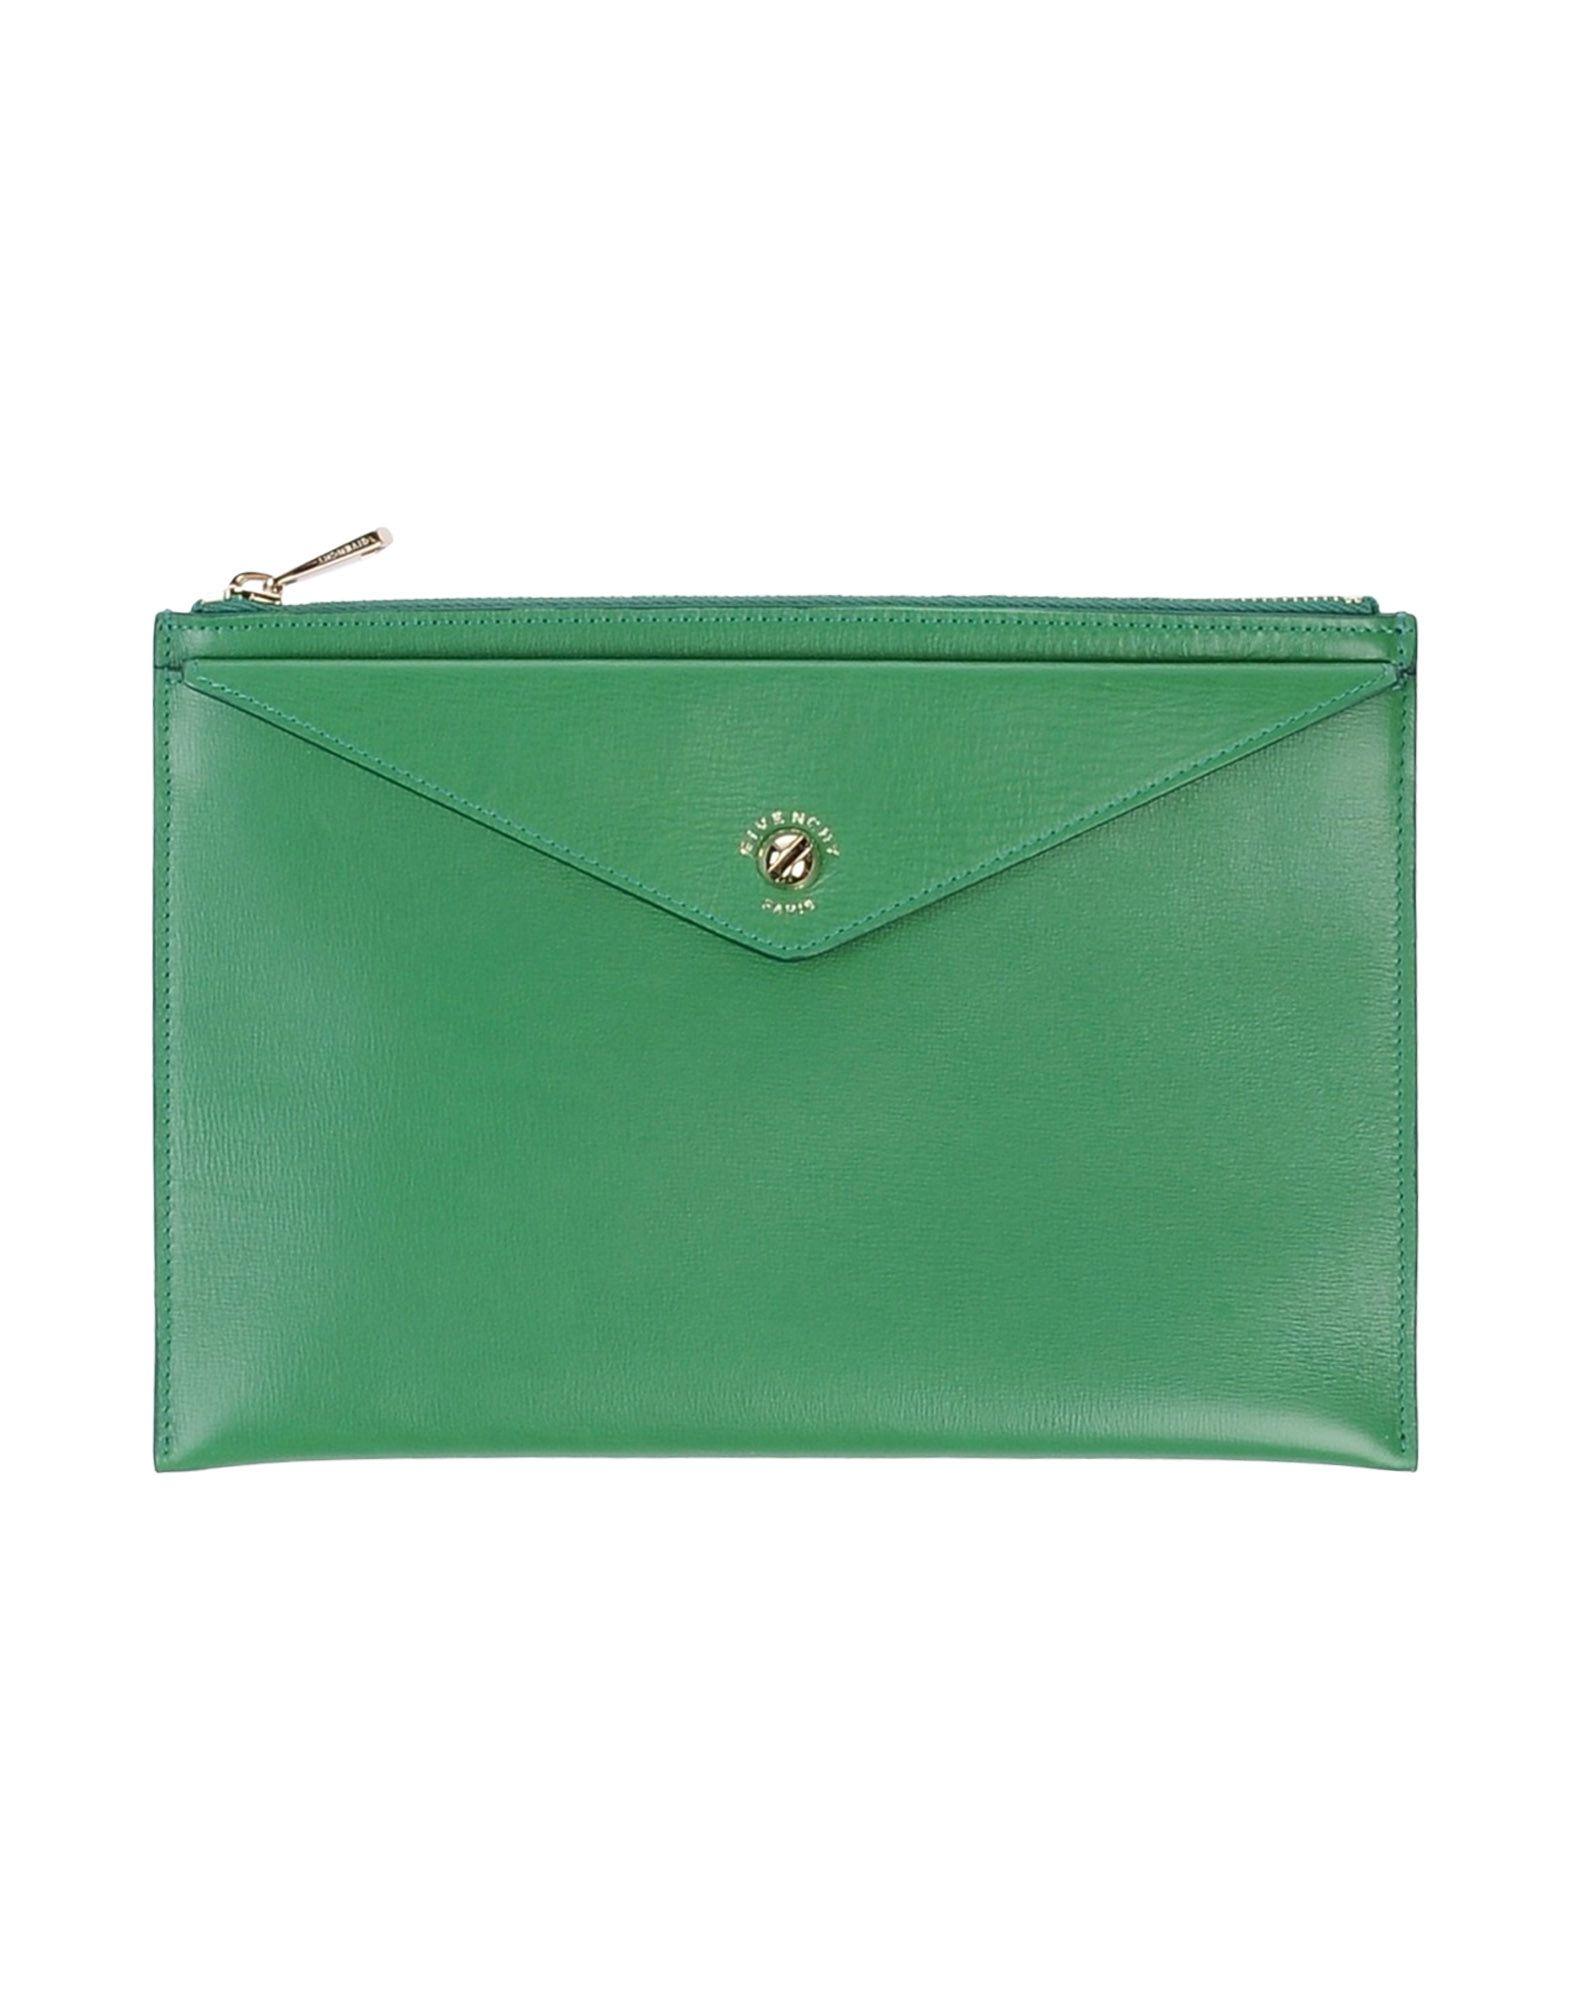 GIVENCHY Damen Handtaschen Farbe Vert Émeraude Größe 1